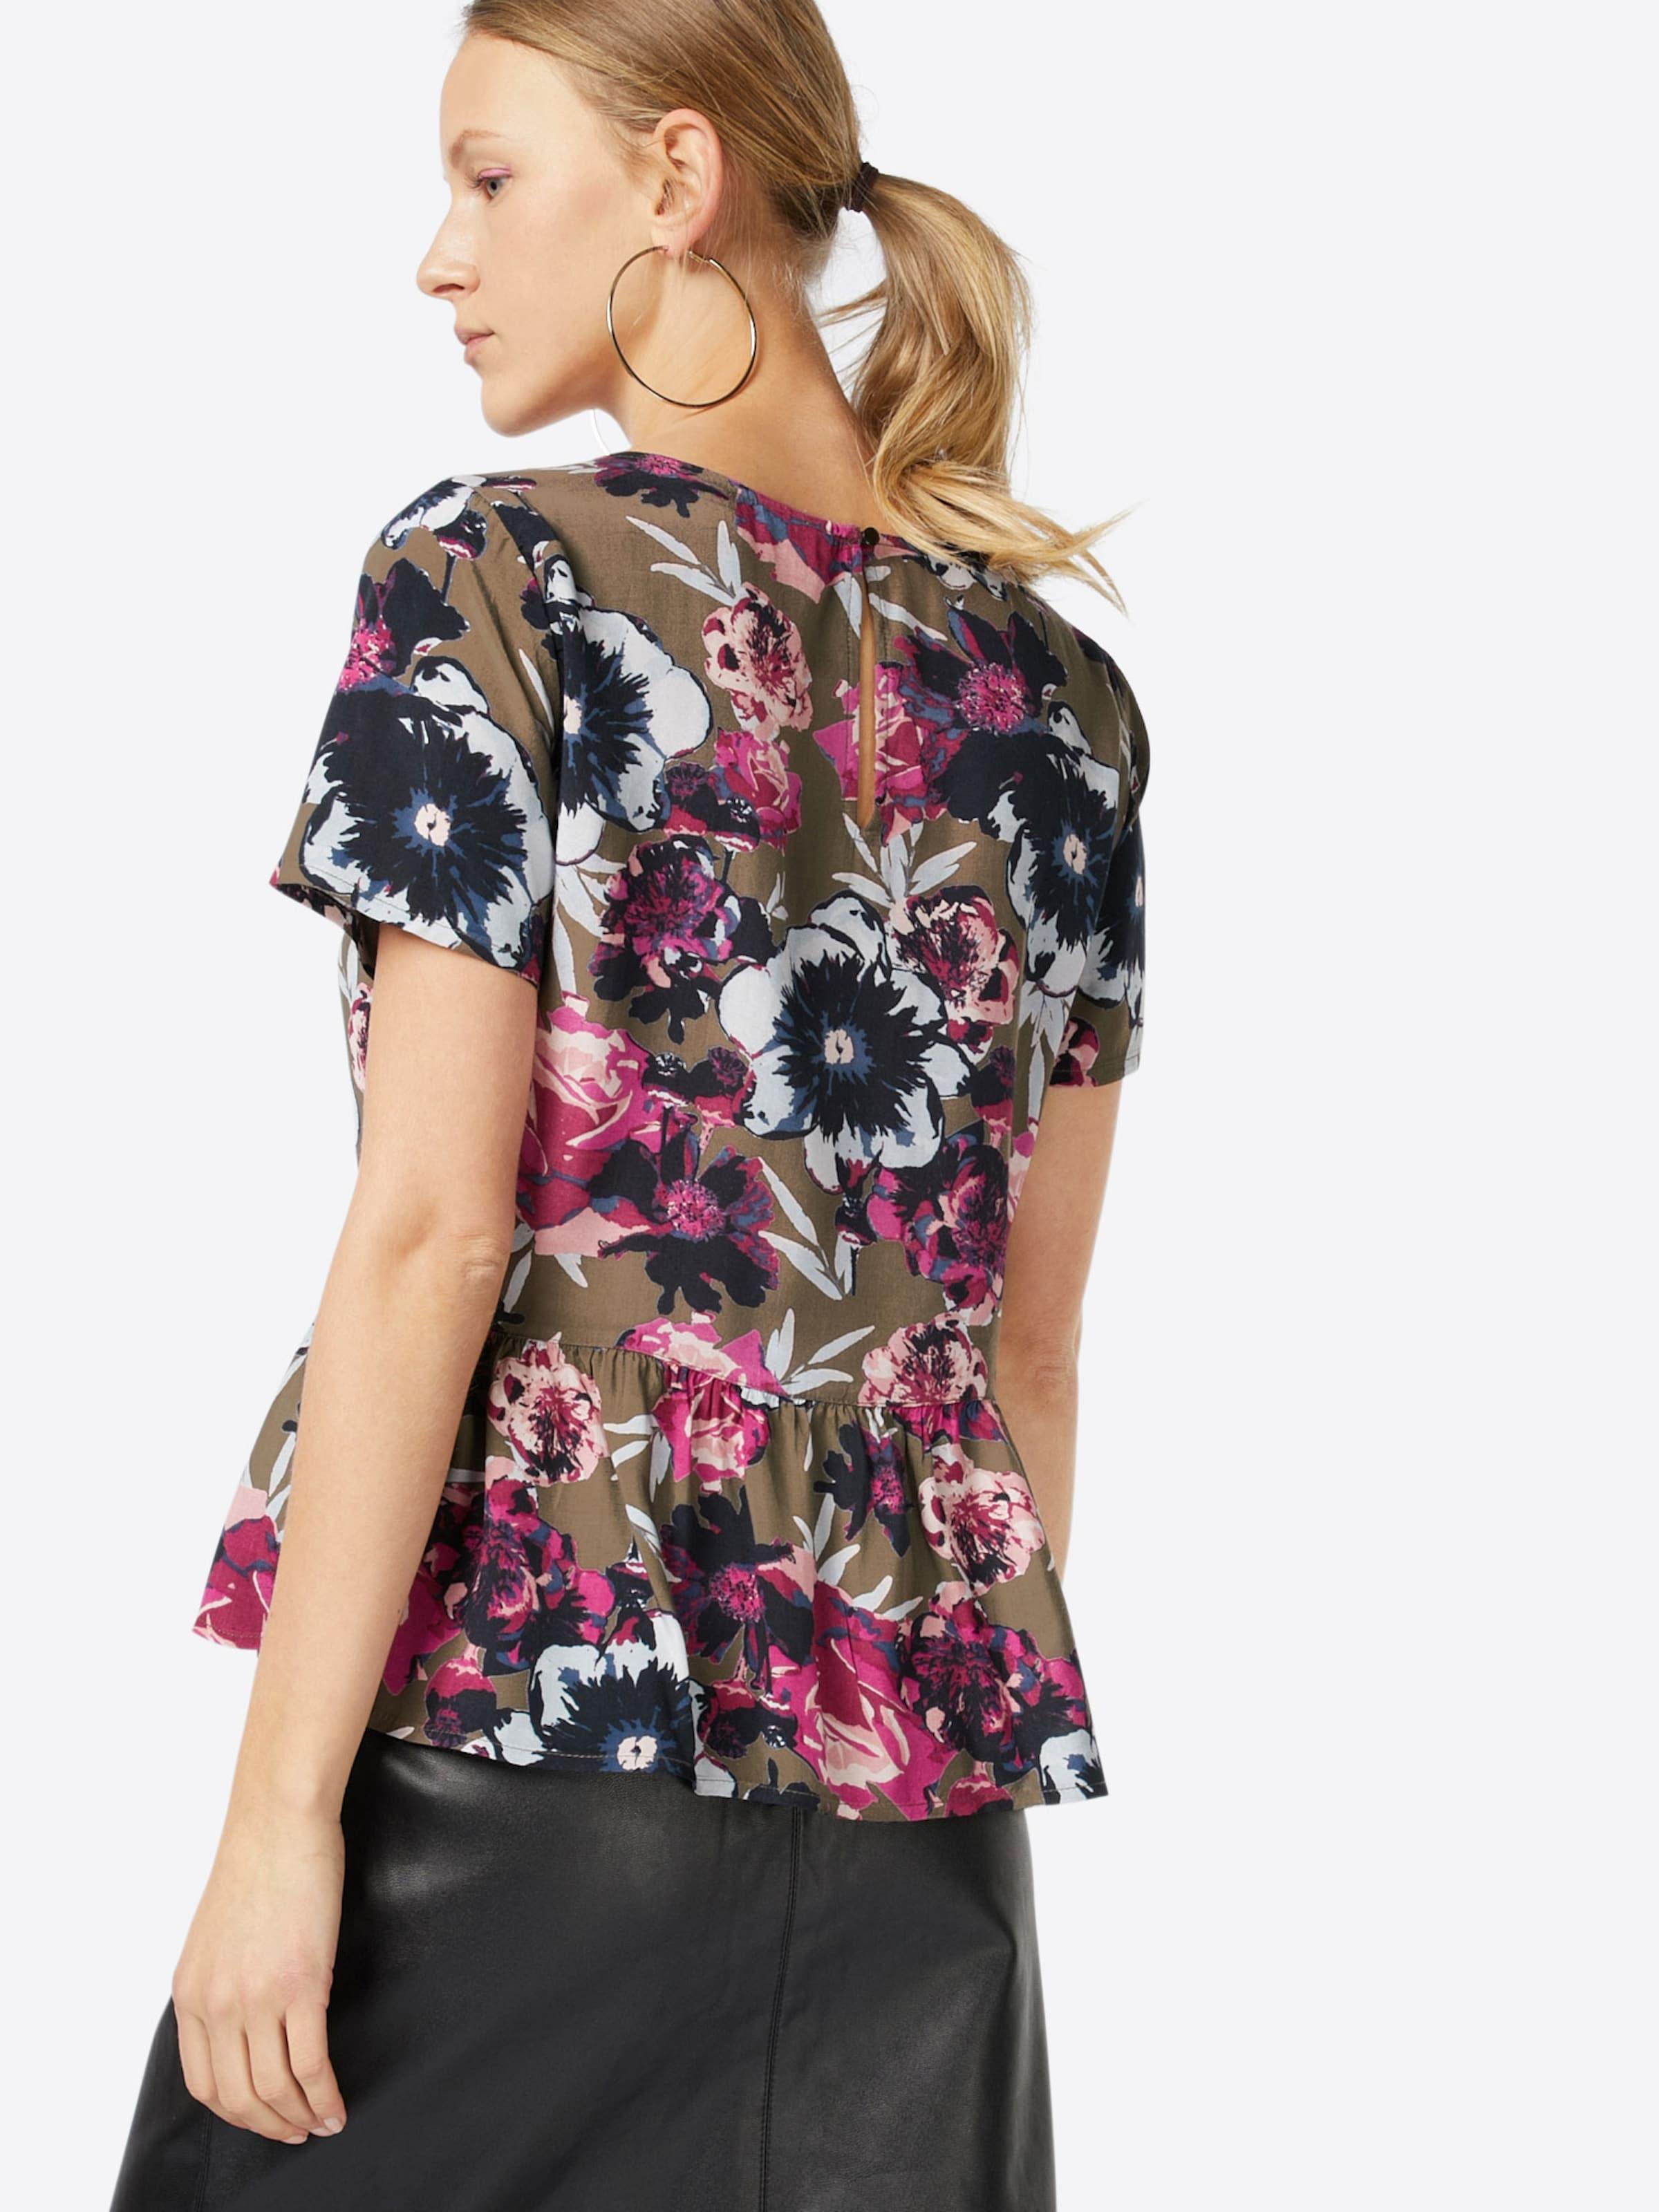 VILA Shirt 'VIASTHA' Outlet Mode-Stil Billig Einkaufen Fabrikverkauf mi1vzVixbJ